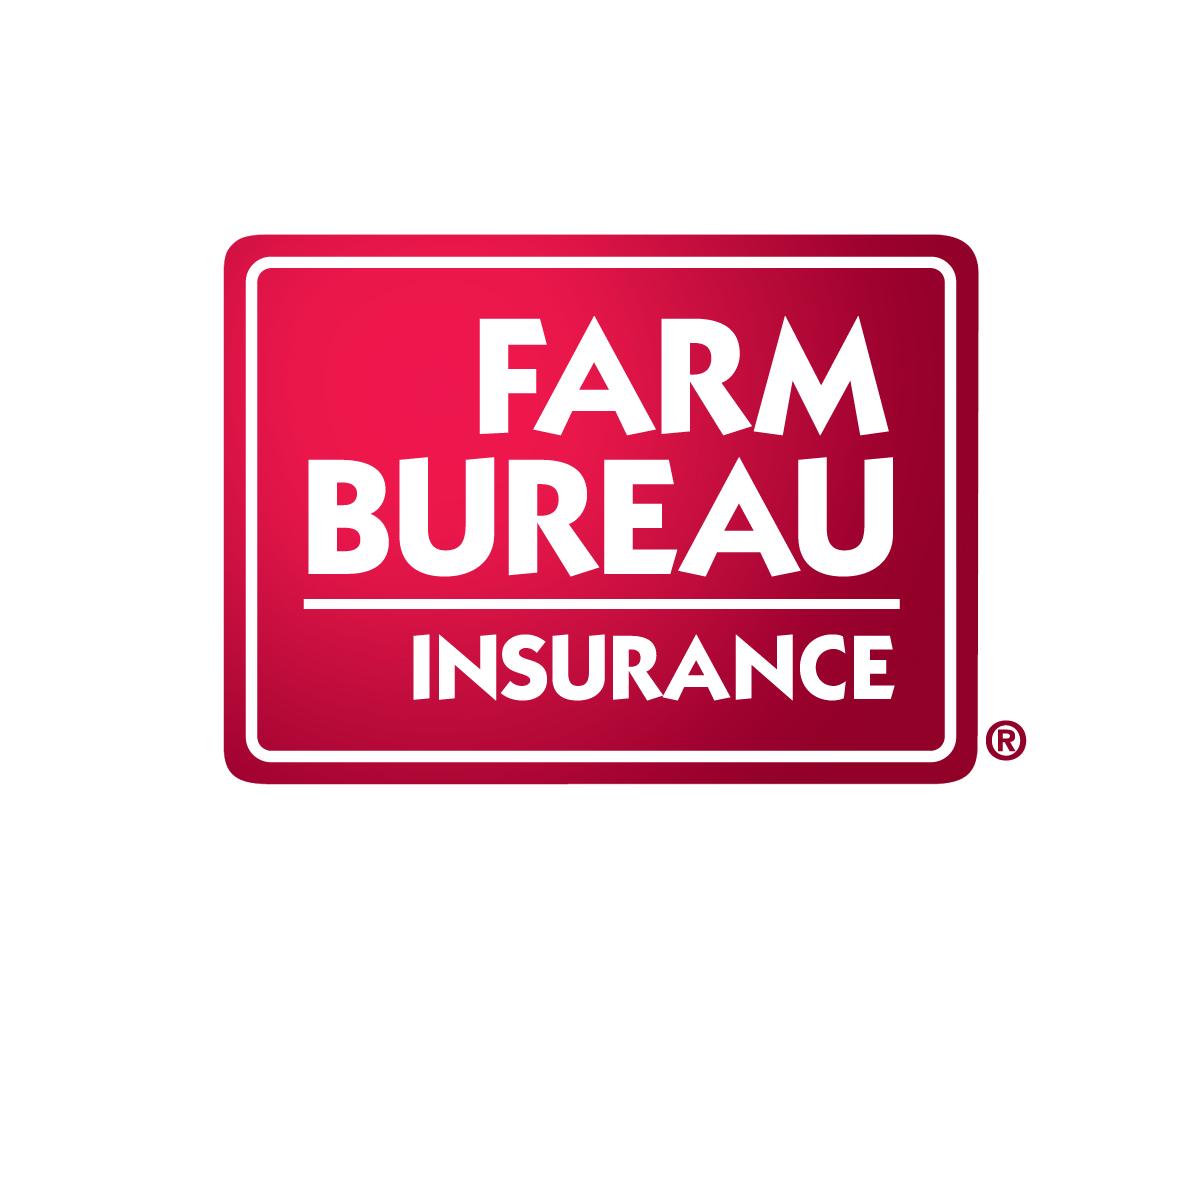 Farm bureau insurance america and me essay contest for Bureau insurance